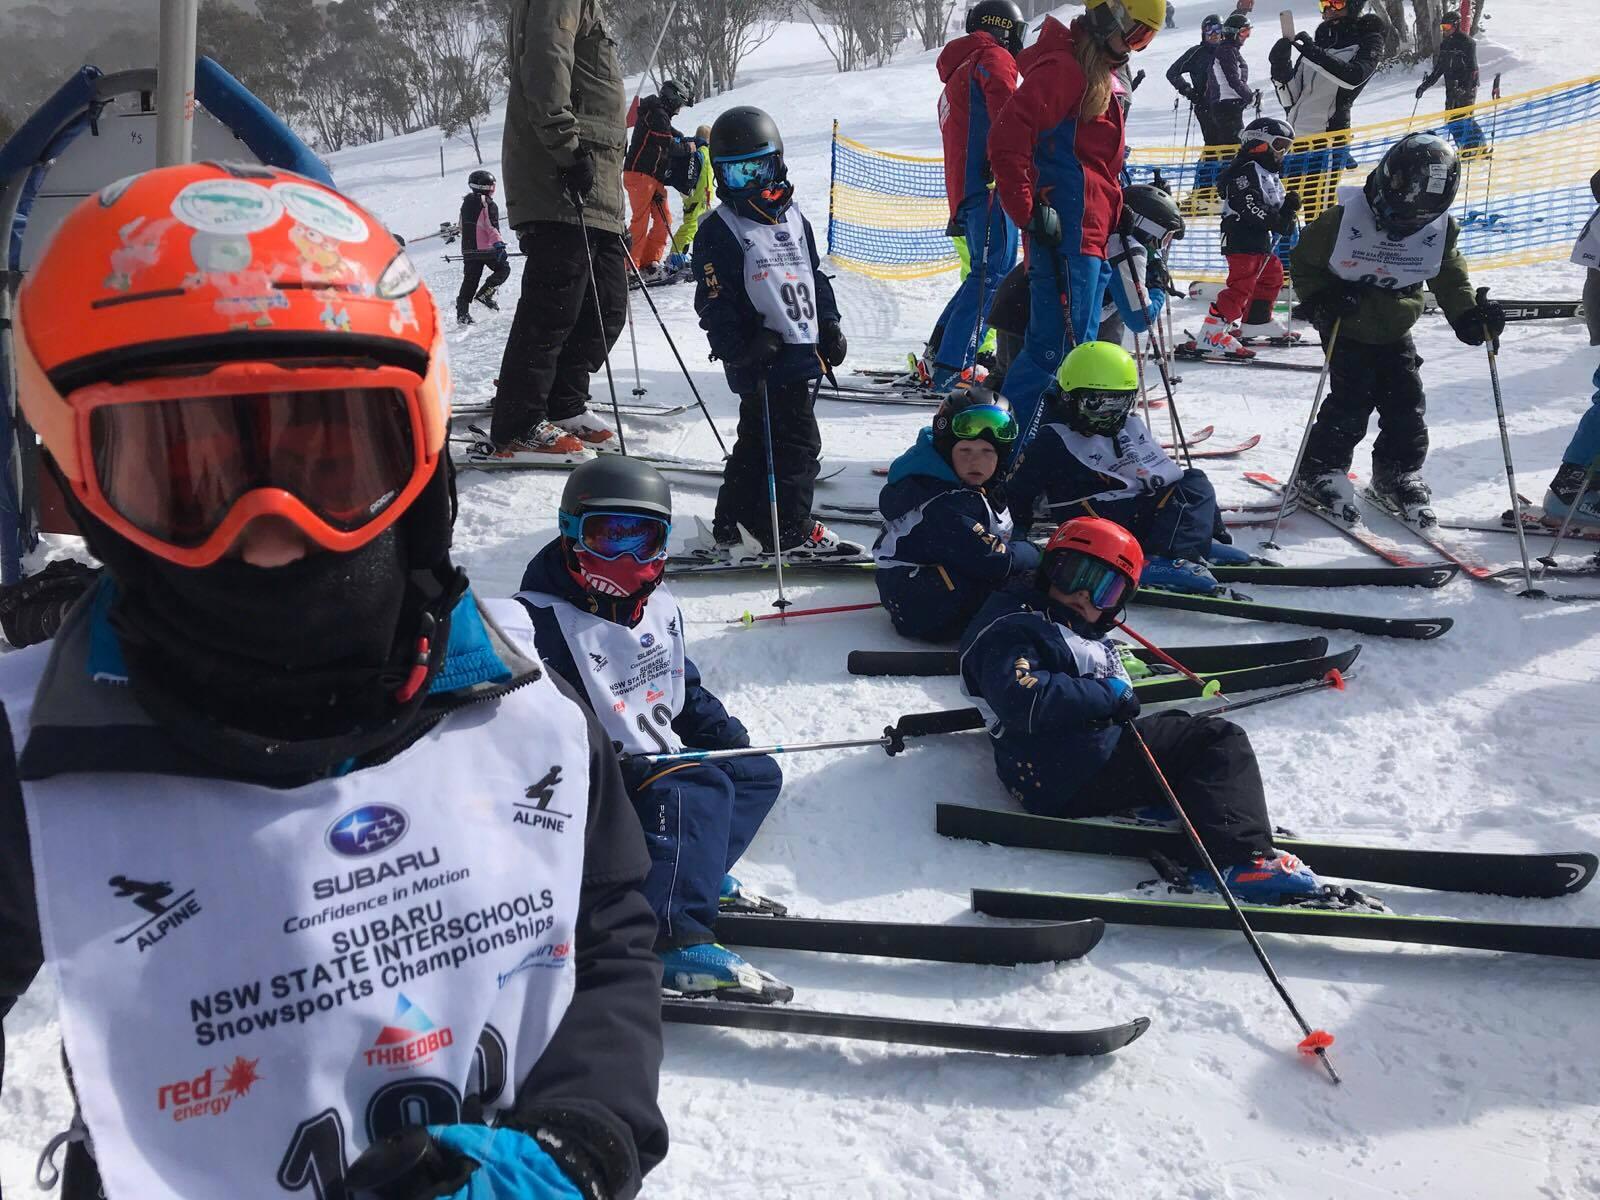 SMGS NSW State Interschools Snowsports